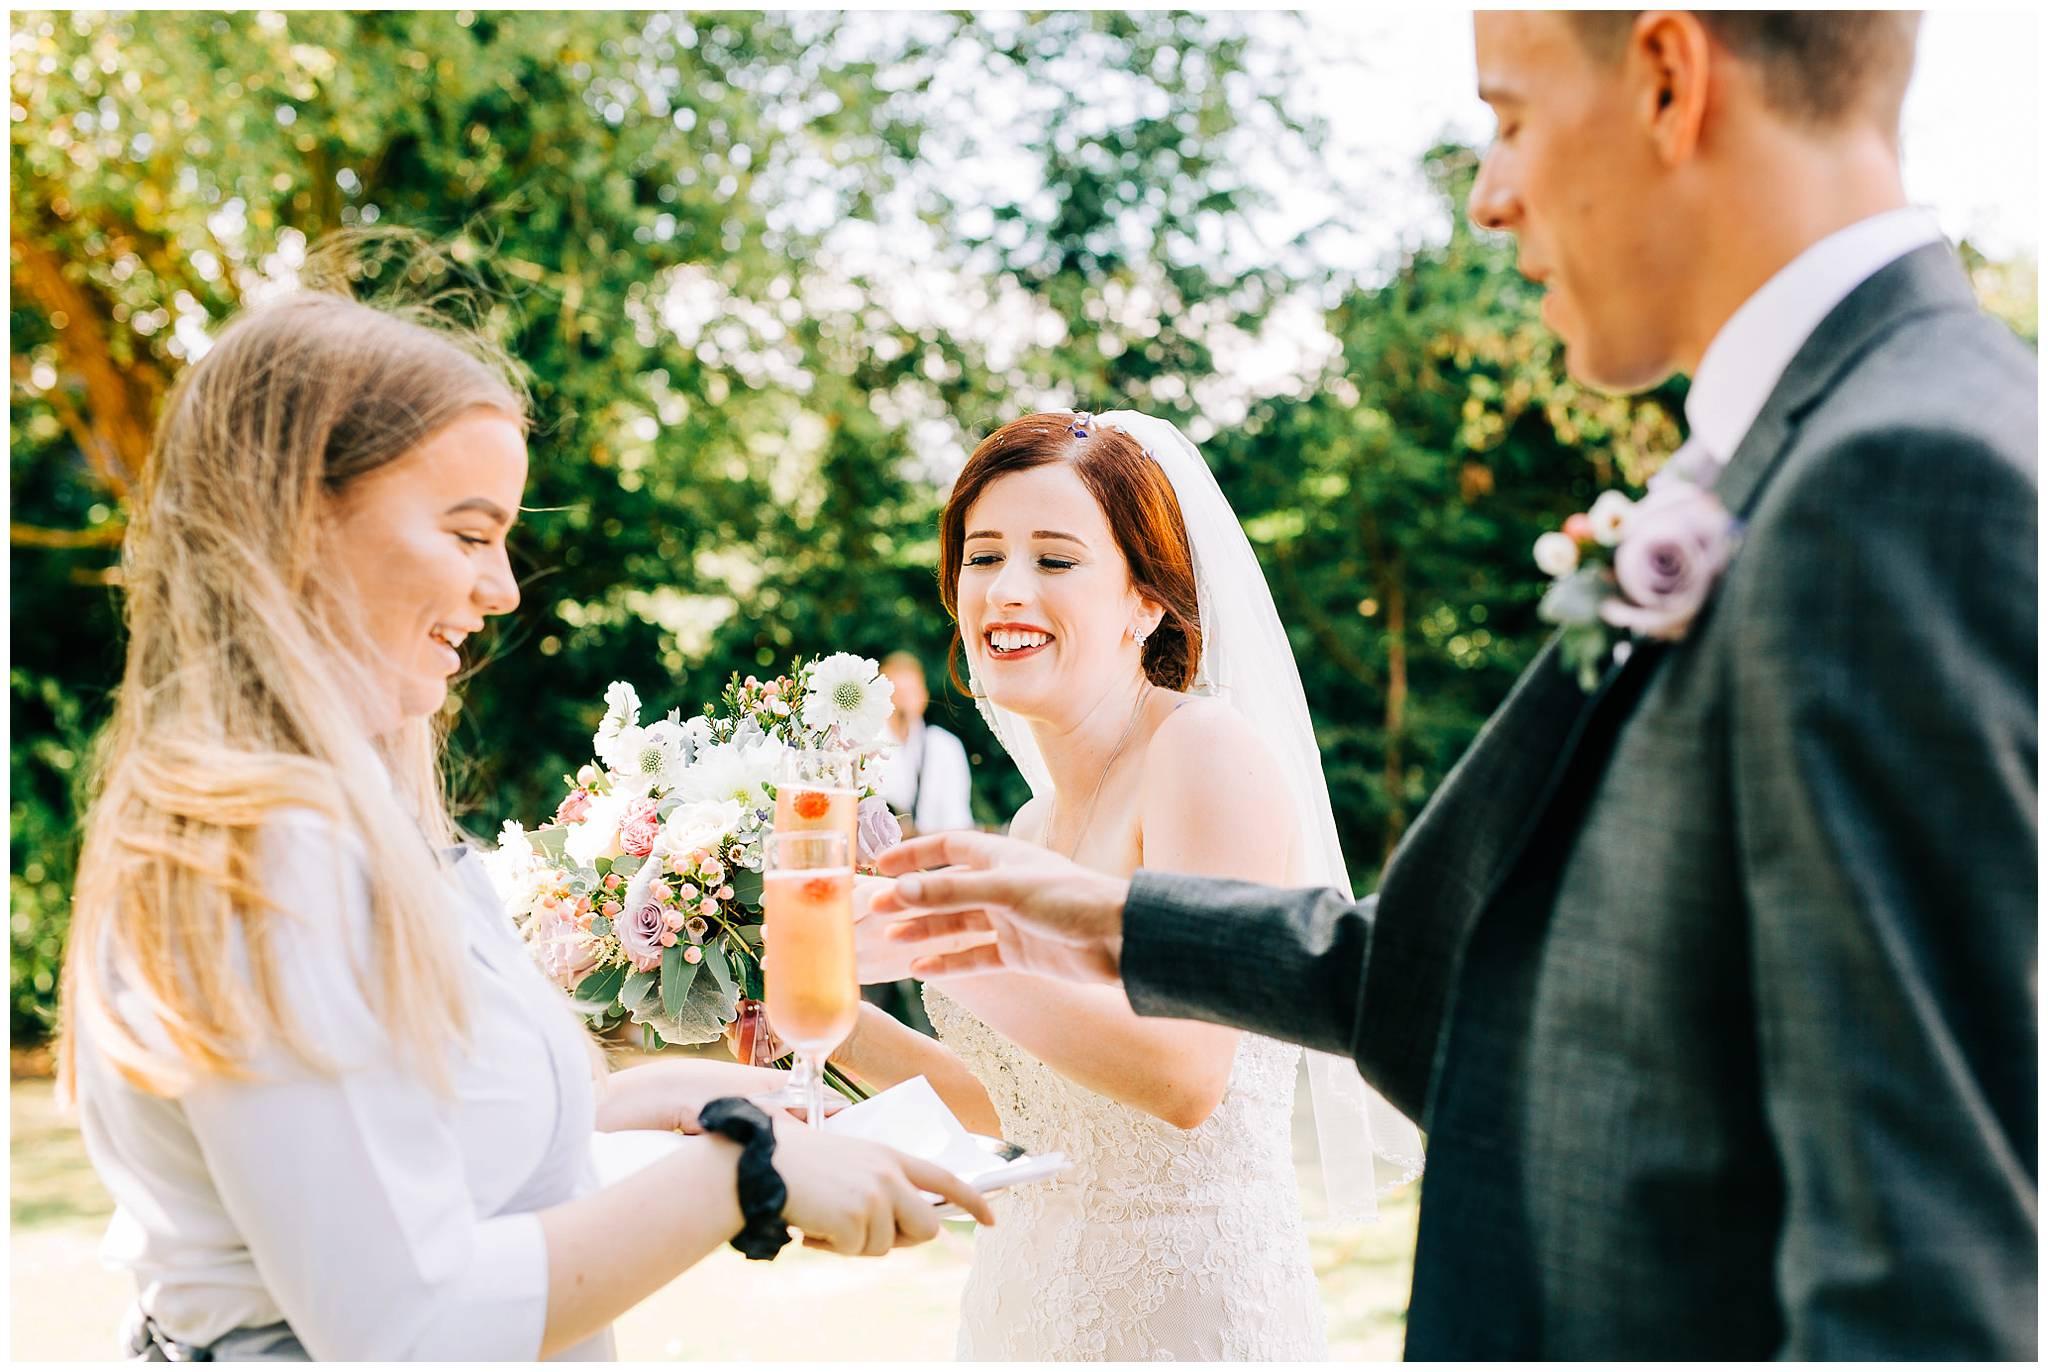 Summer Garden Wedding - The Old Vicarage Boutique Hotel48.jpg